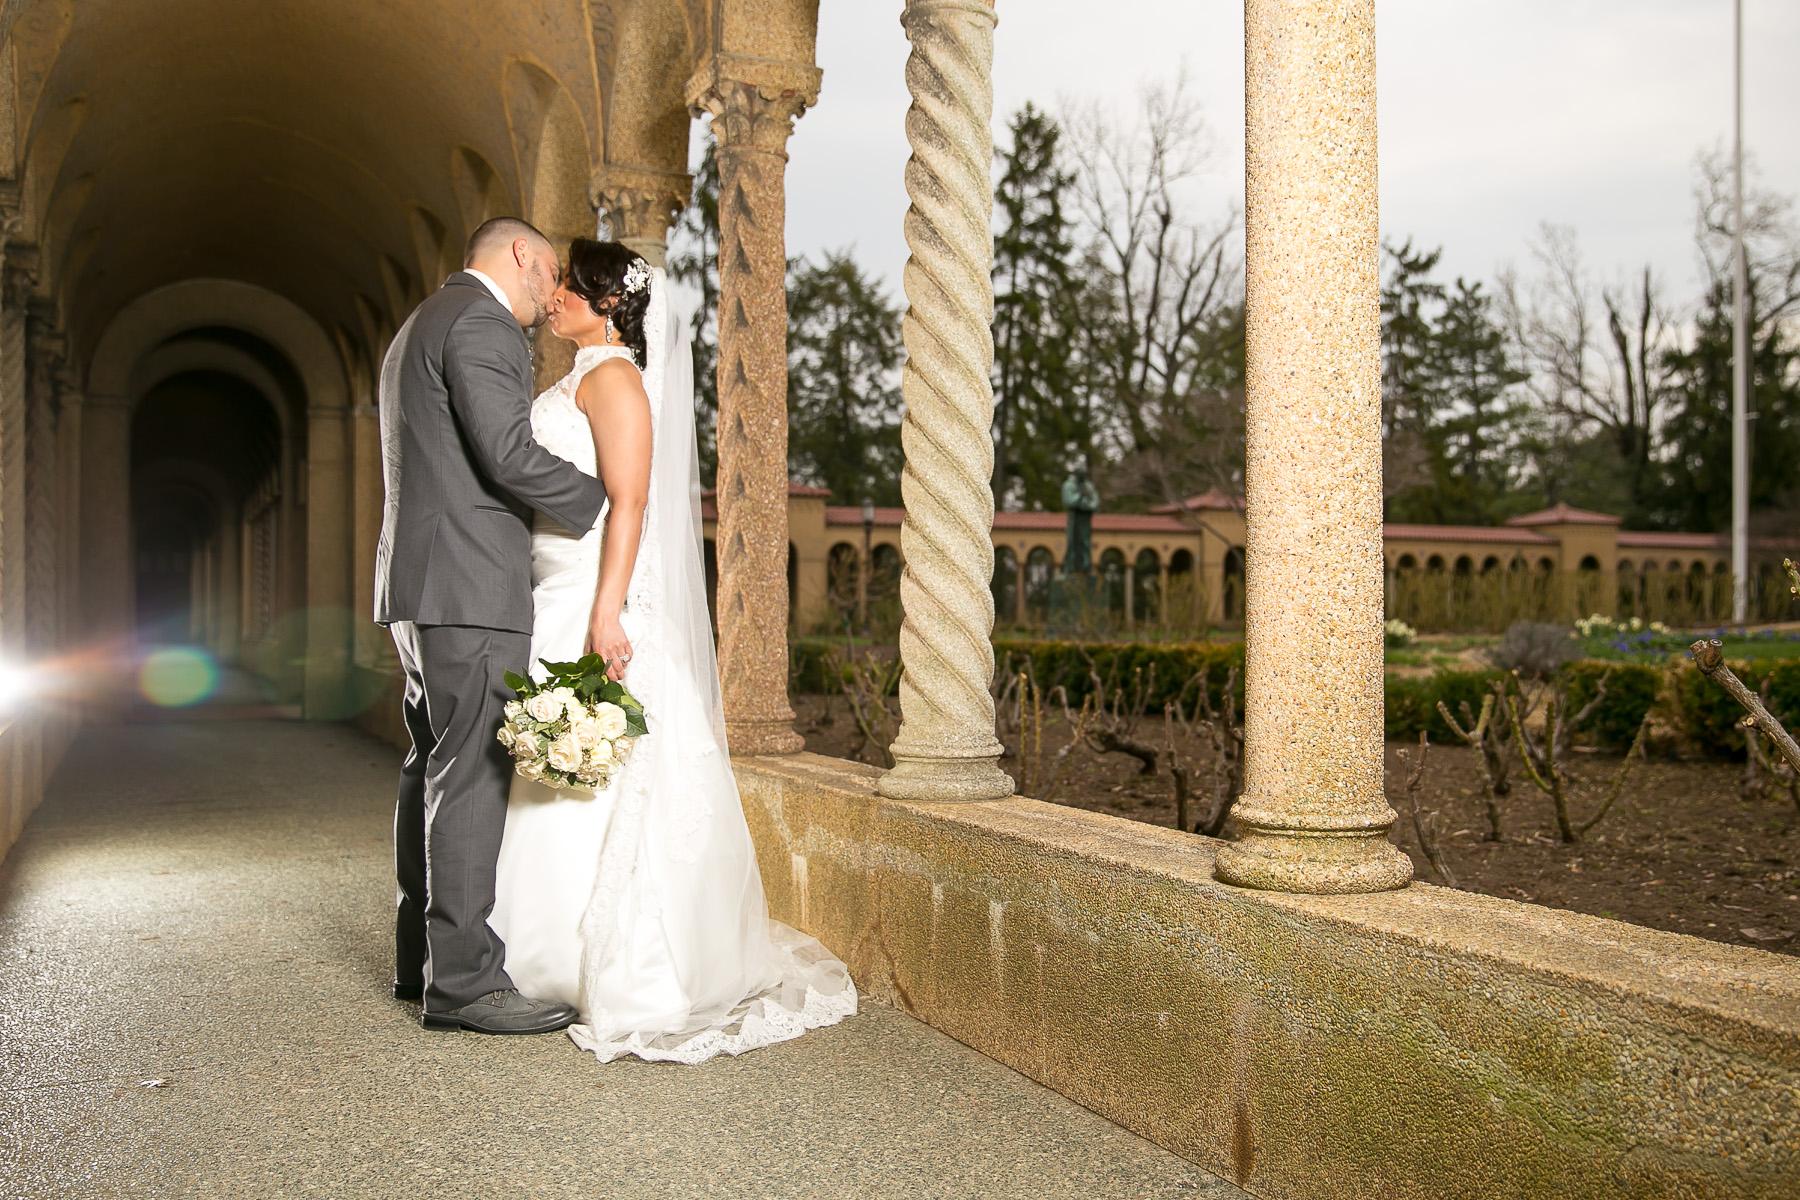 Bradly-and-Jesenia-Wedding-WQ-217.jpg